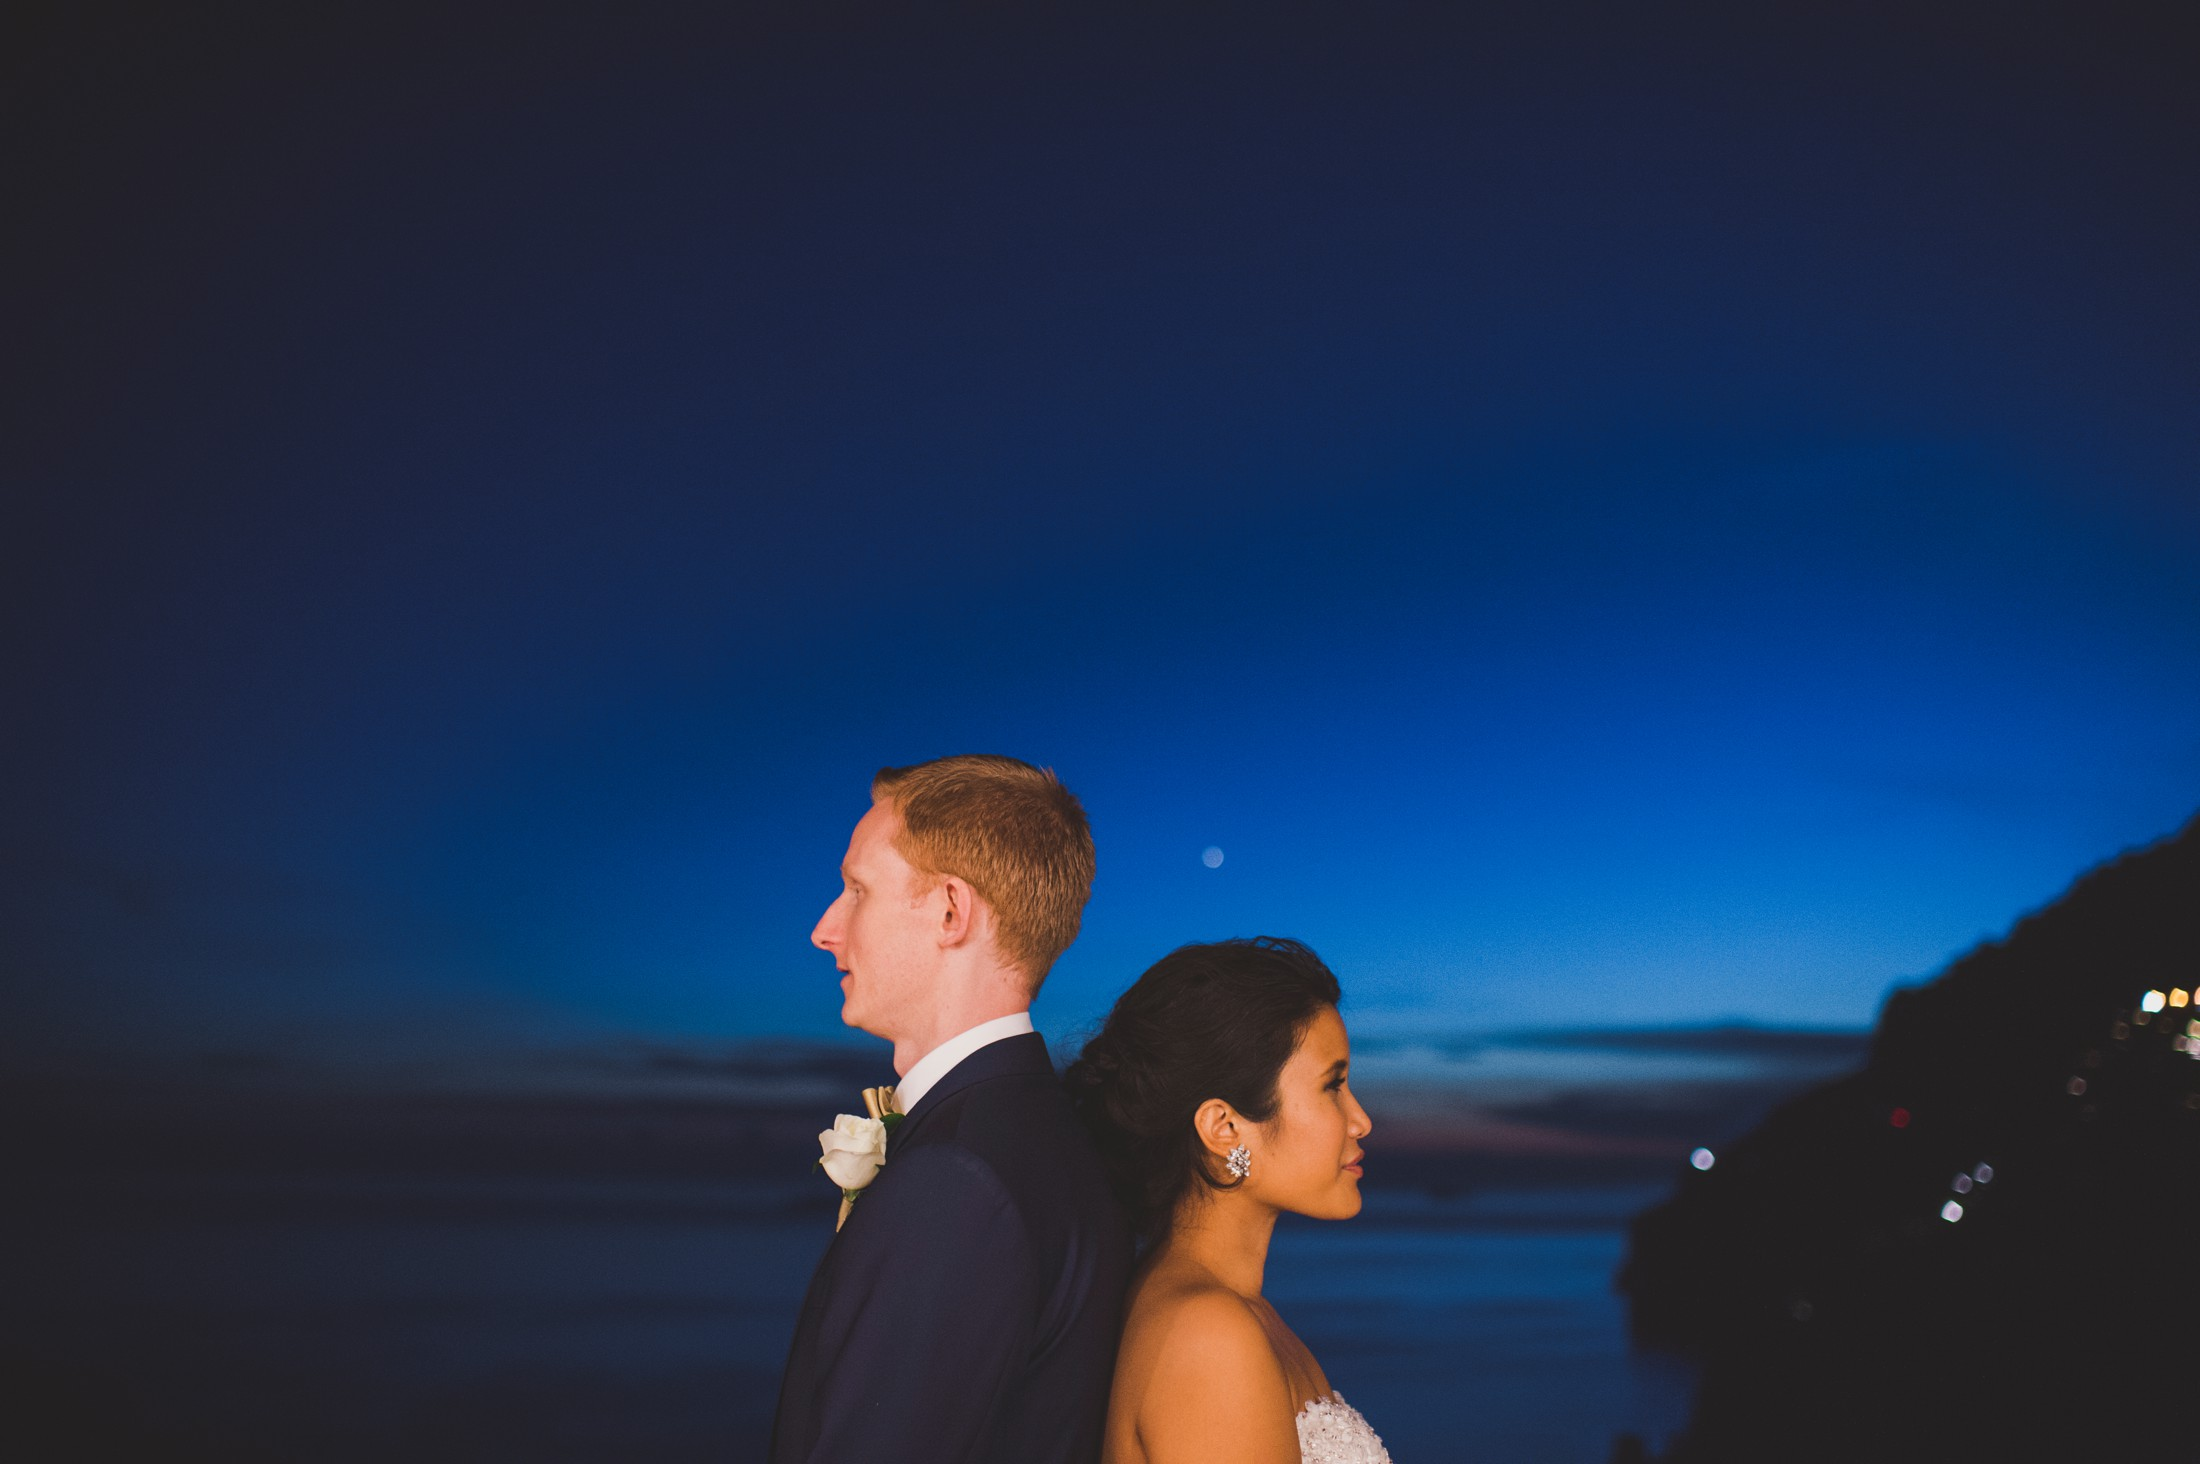 positano wedding bride and groom's portrait at nighttime